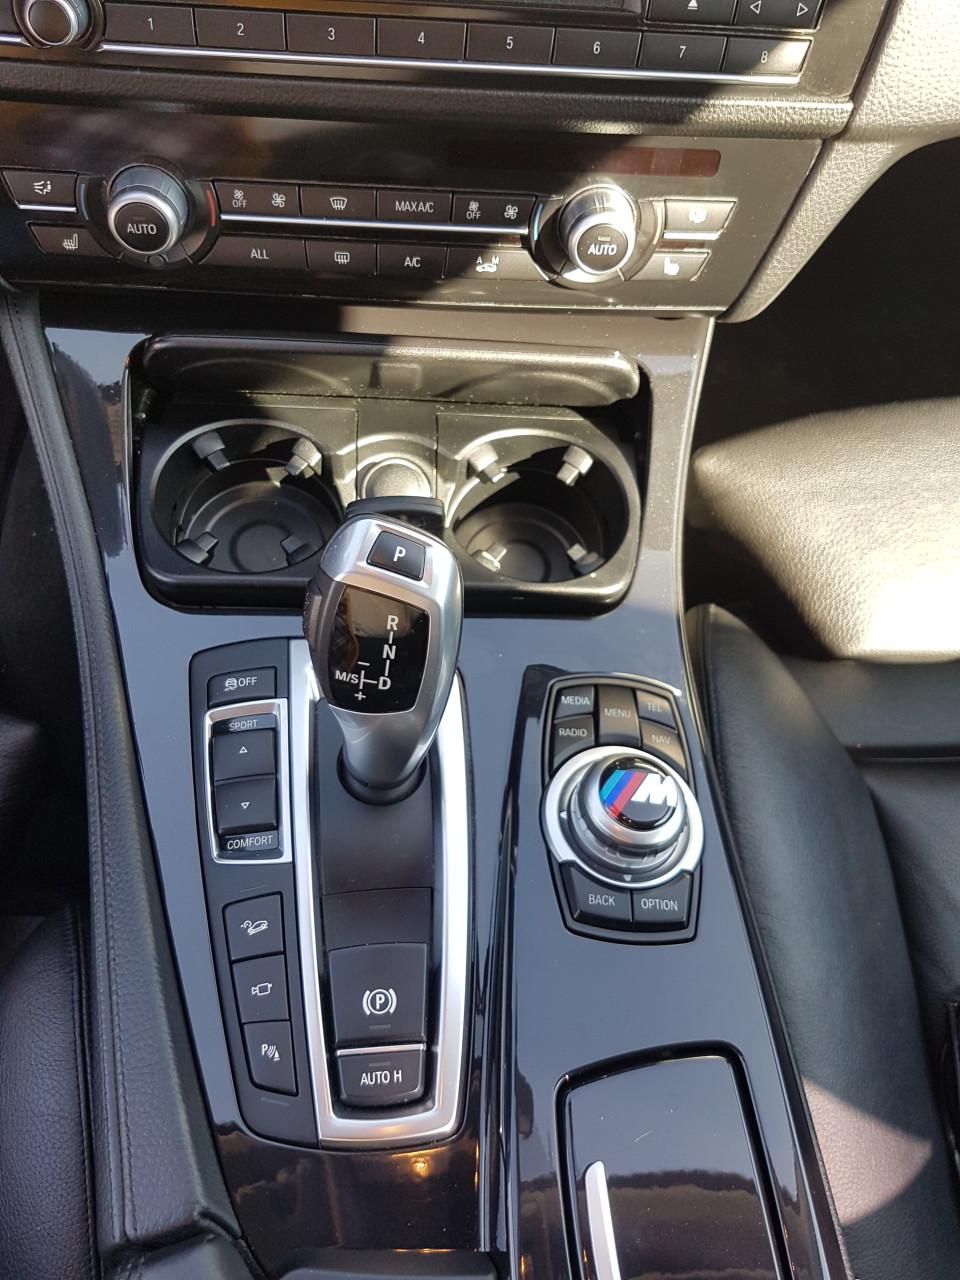 BMW 525 2.0 diesel 2013